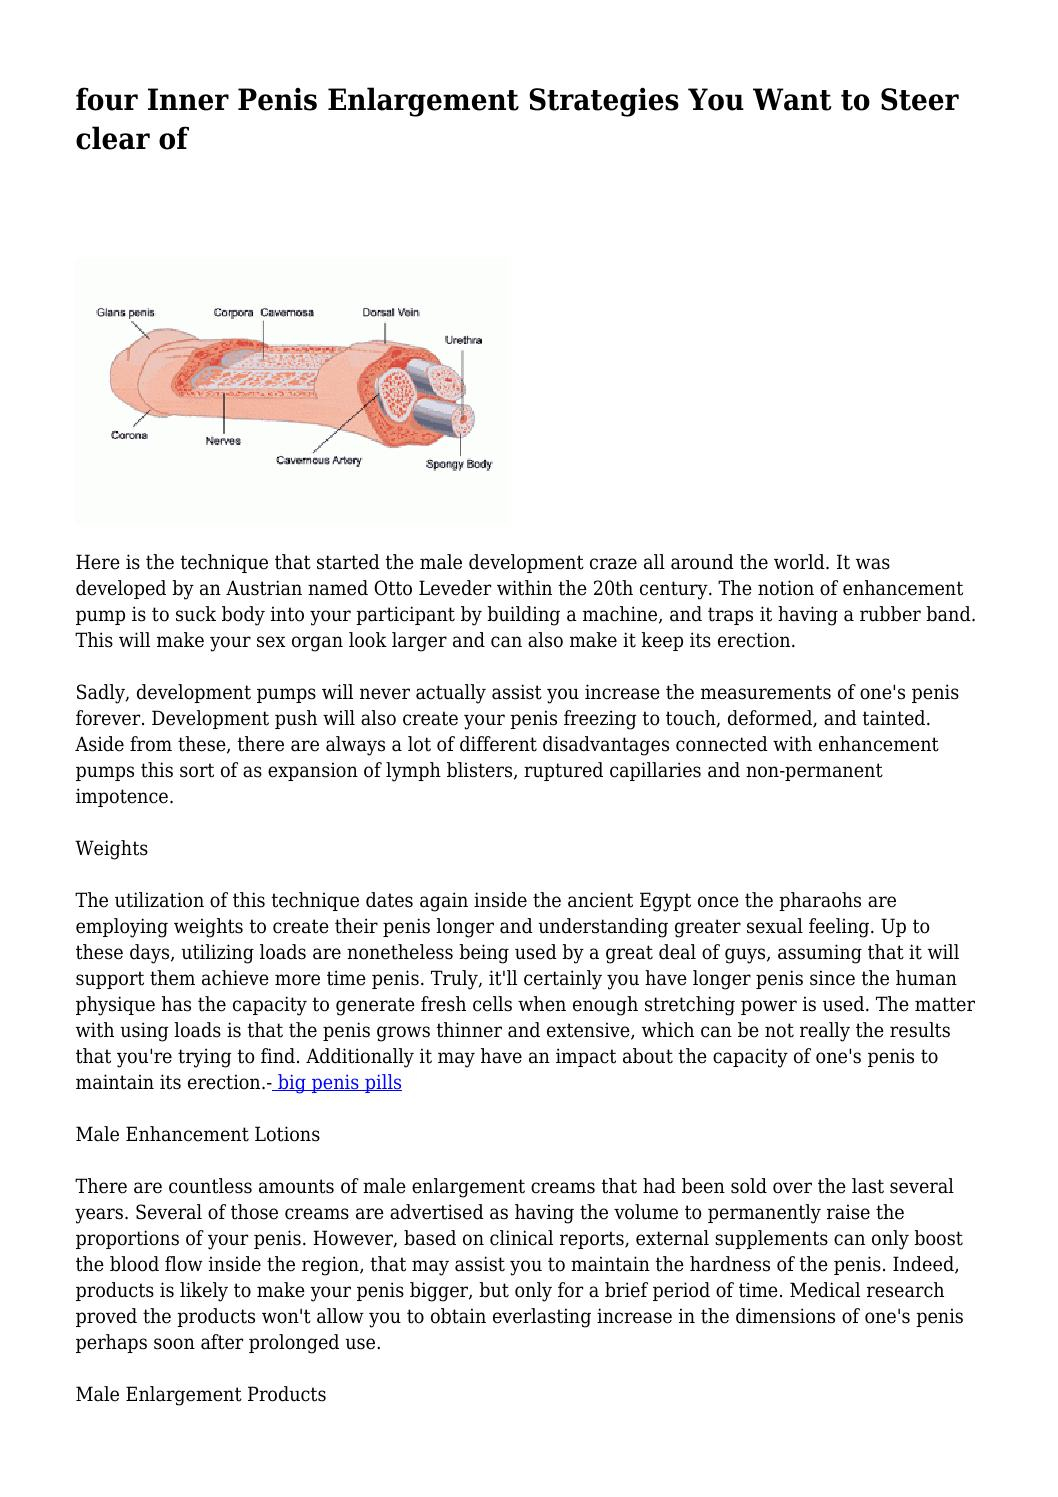 Sexual rubber band technique